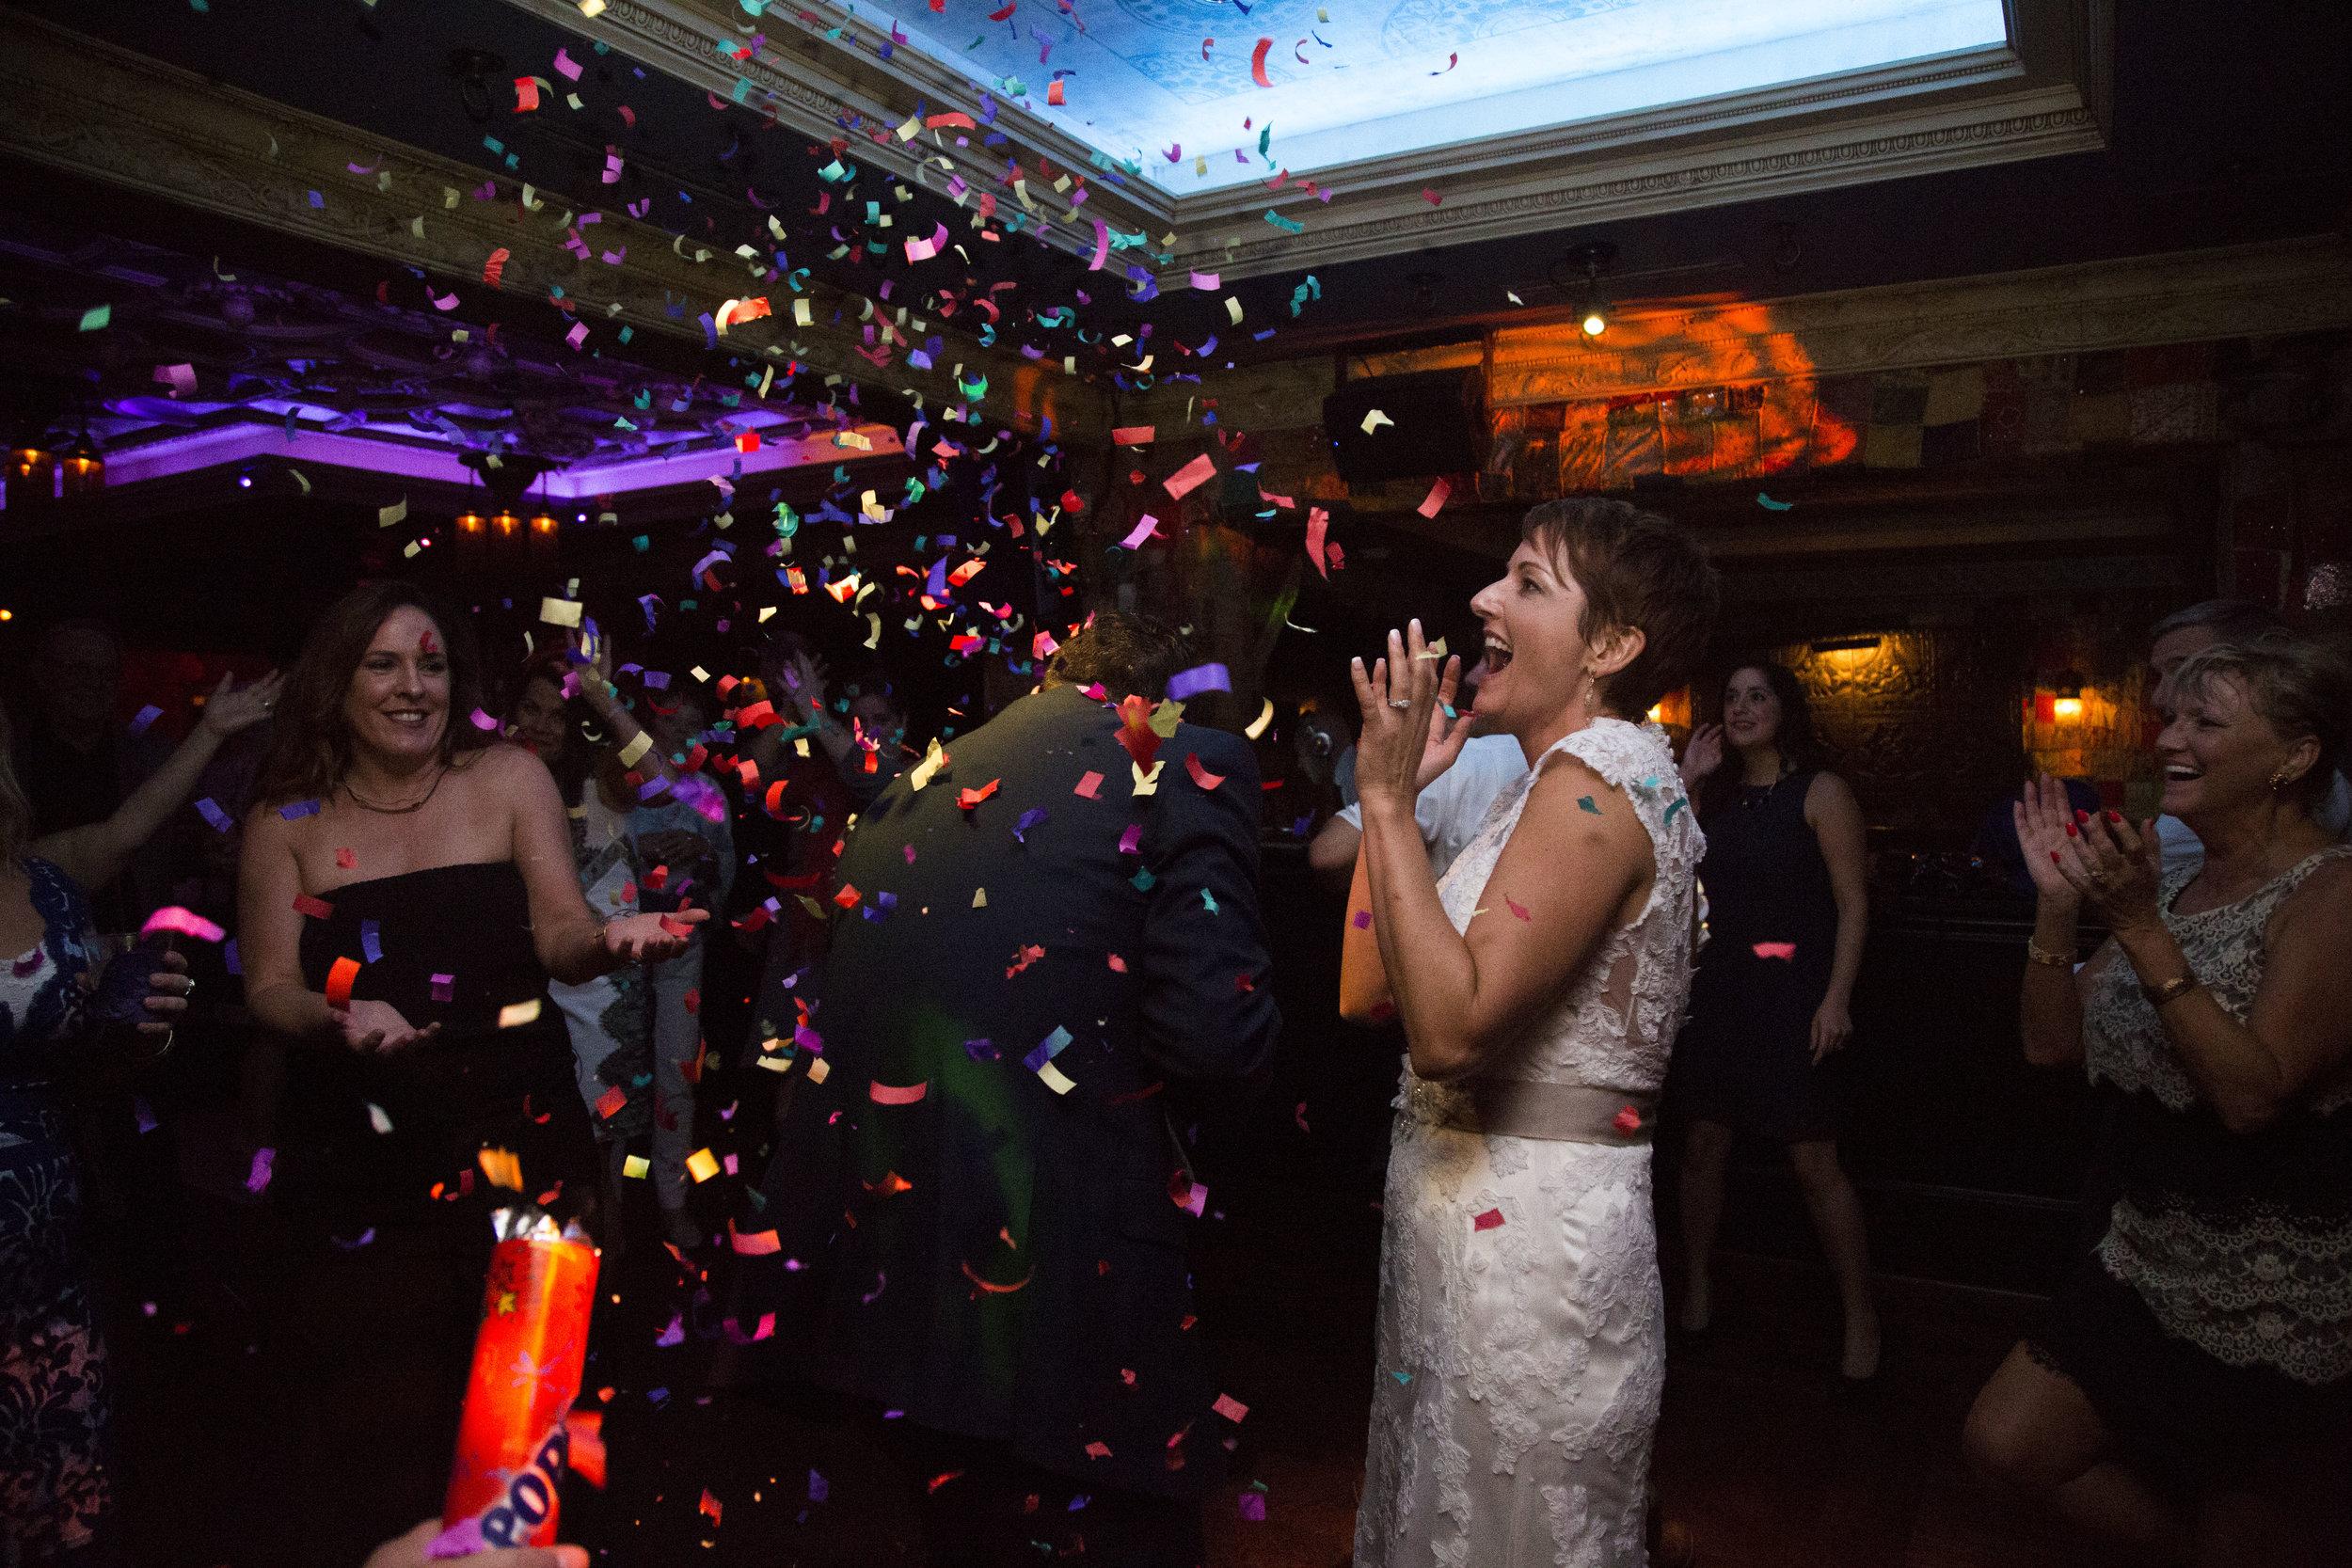 ATGI_Kat and Gabe Wedding 2016_2S8A6237.jpg